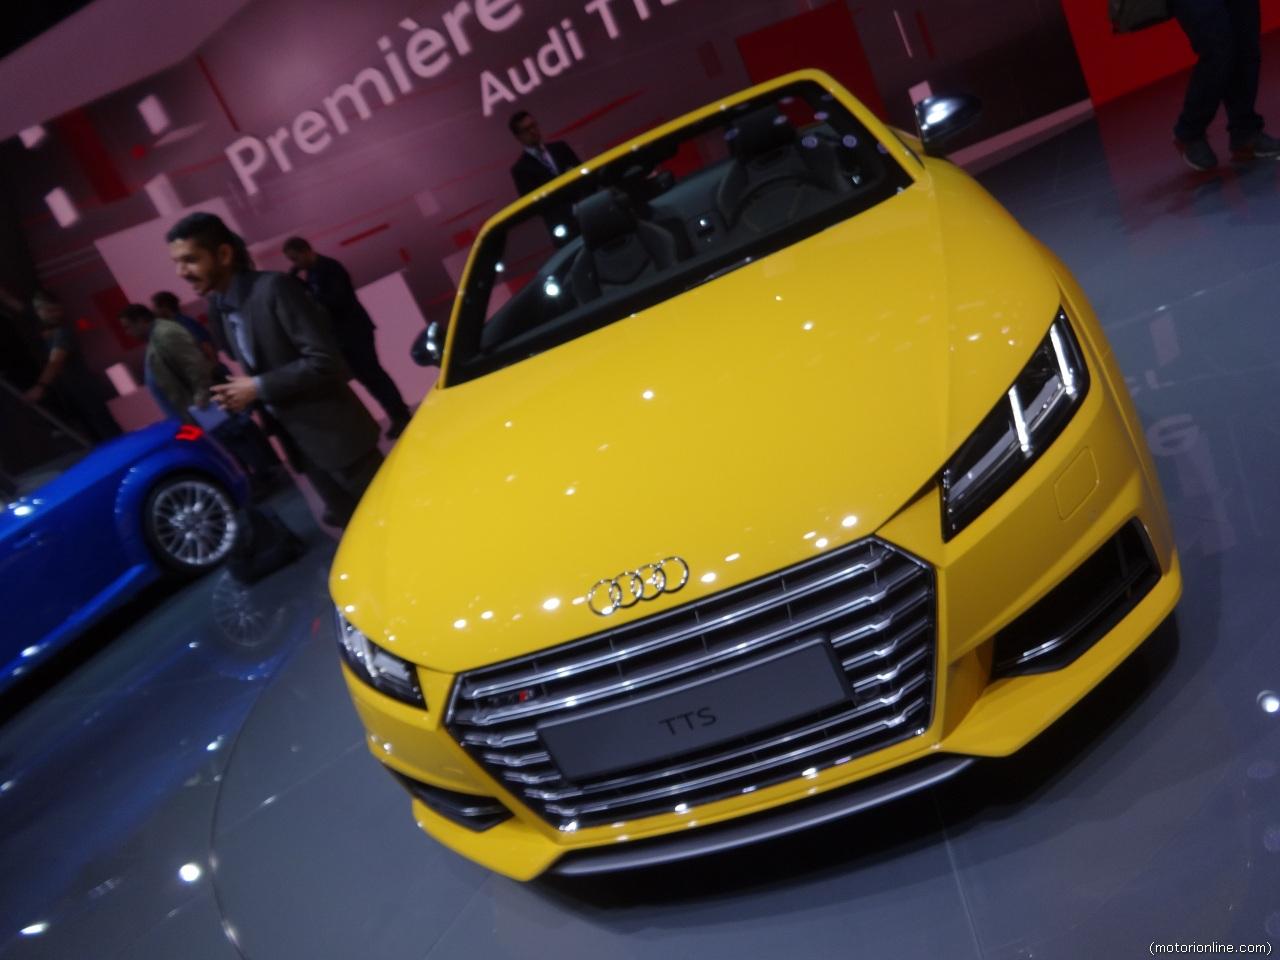 Audi tts salone di parigi 2014 6 8 for Salone mobile parigi